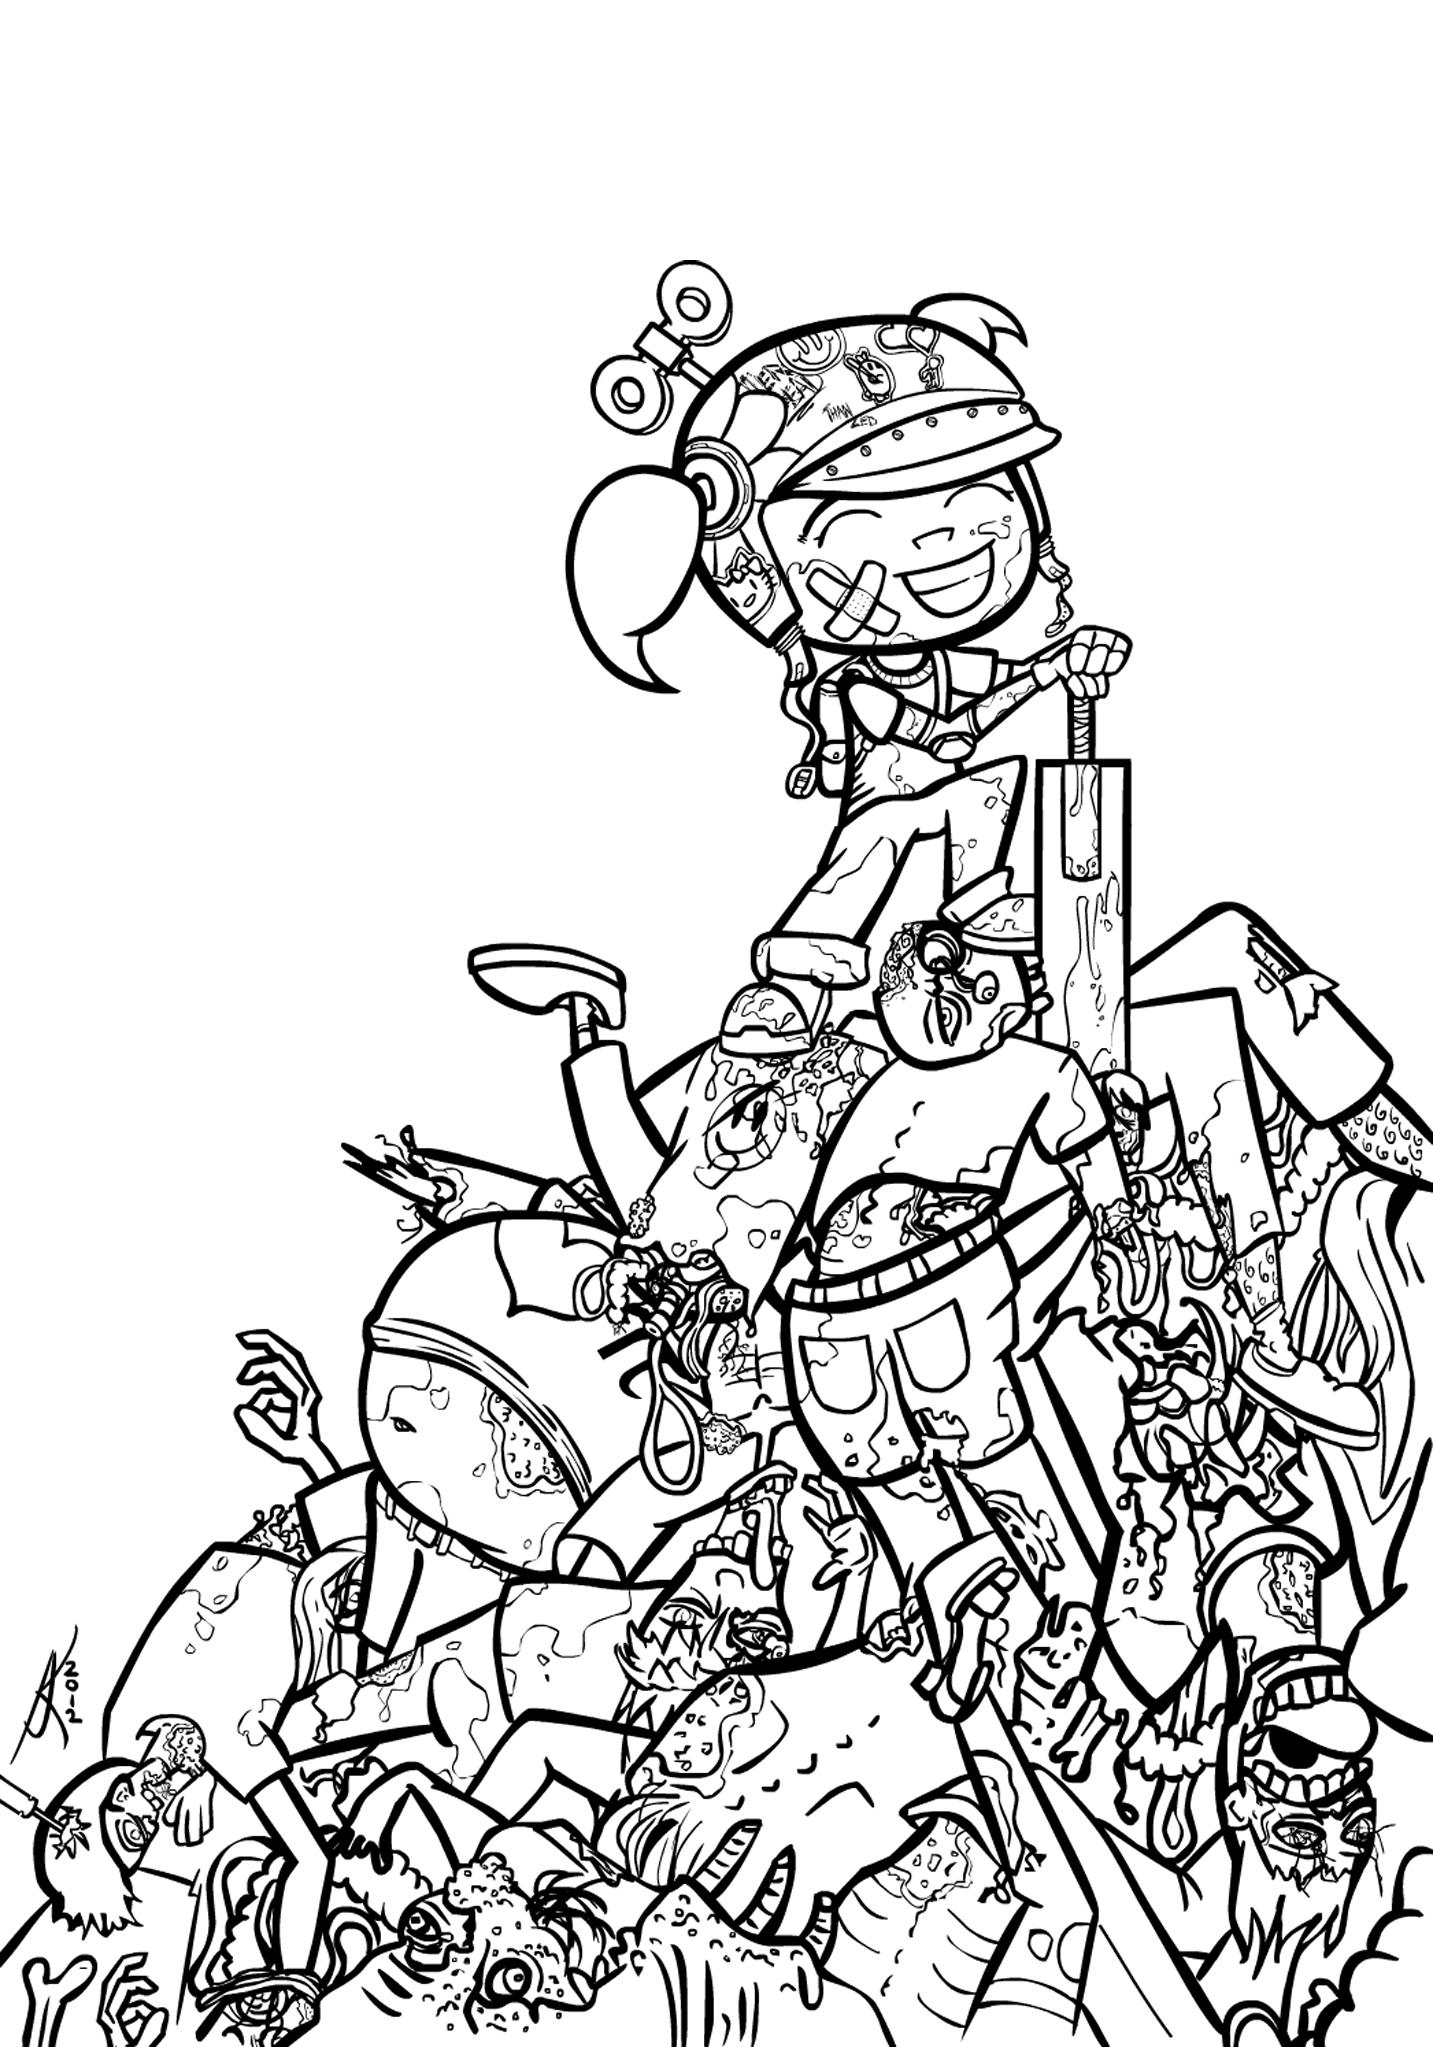 Line Drawing Of A Zombie : Zoe zombie killer line art by heartlessomen on deviantart